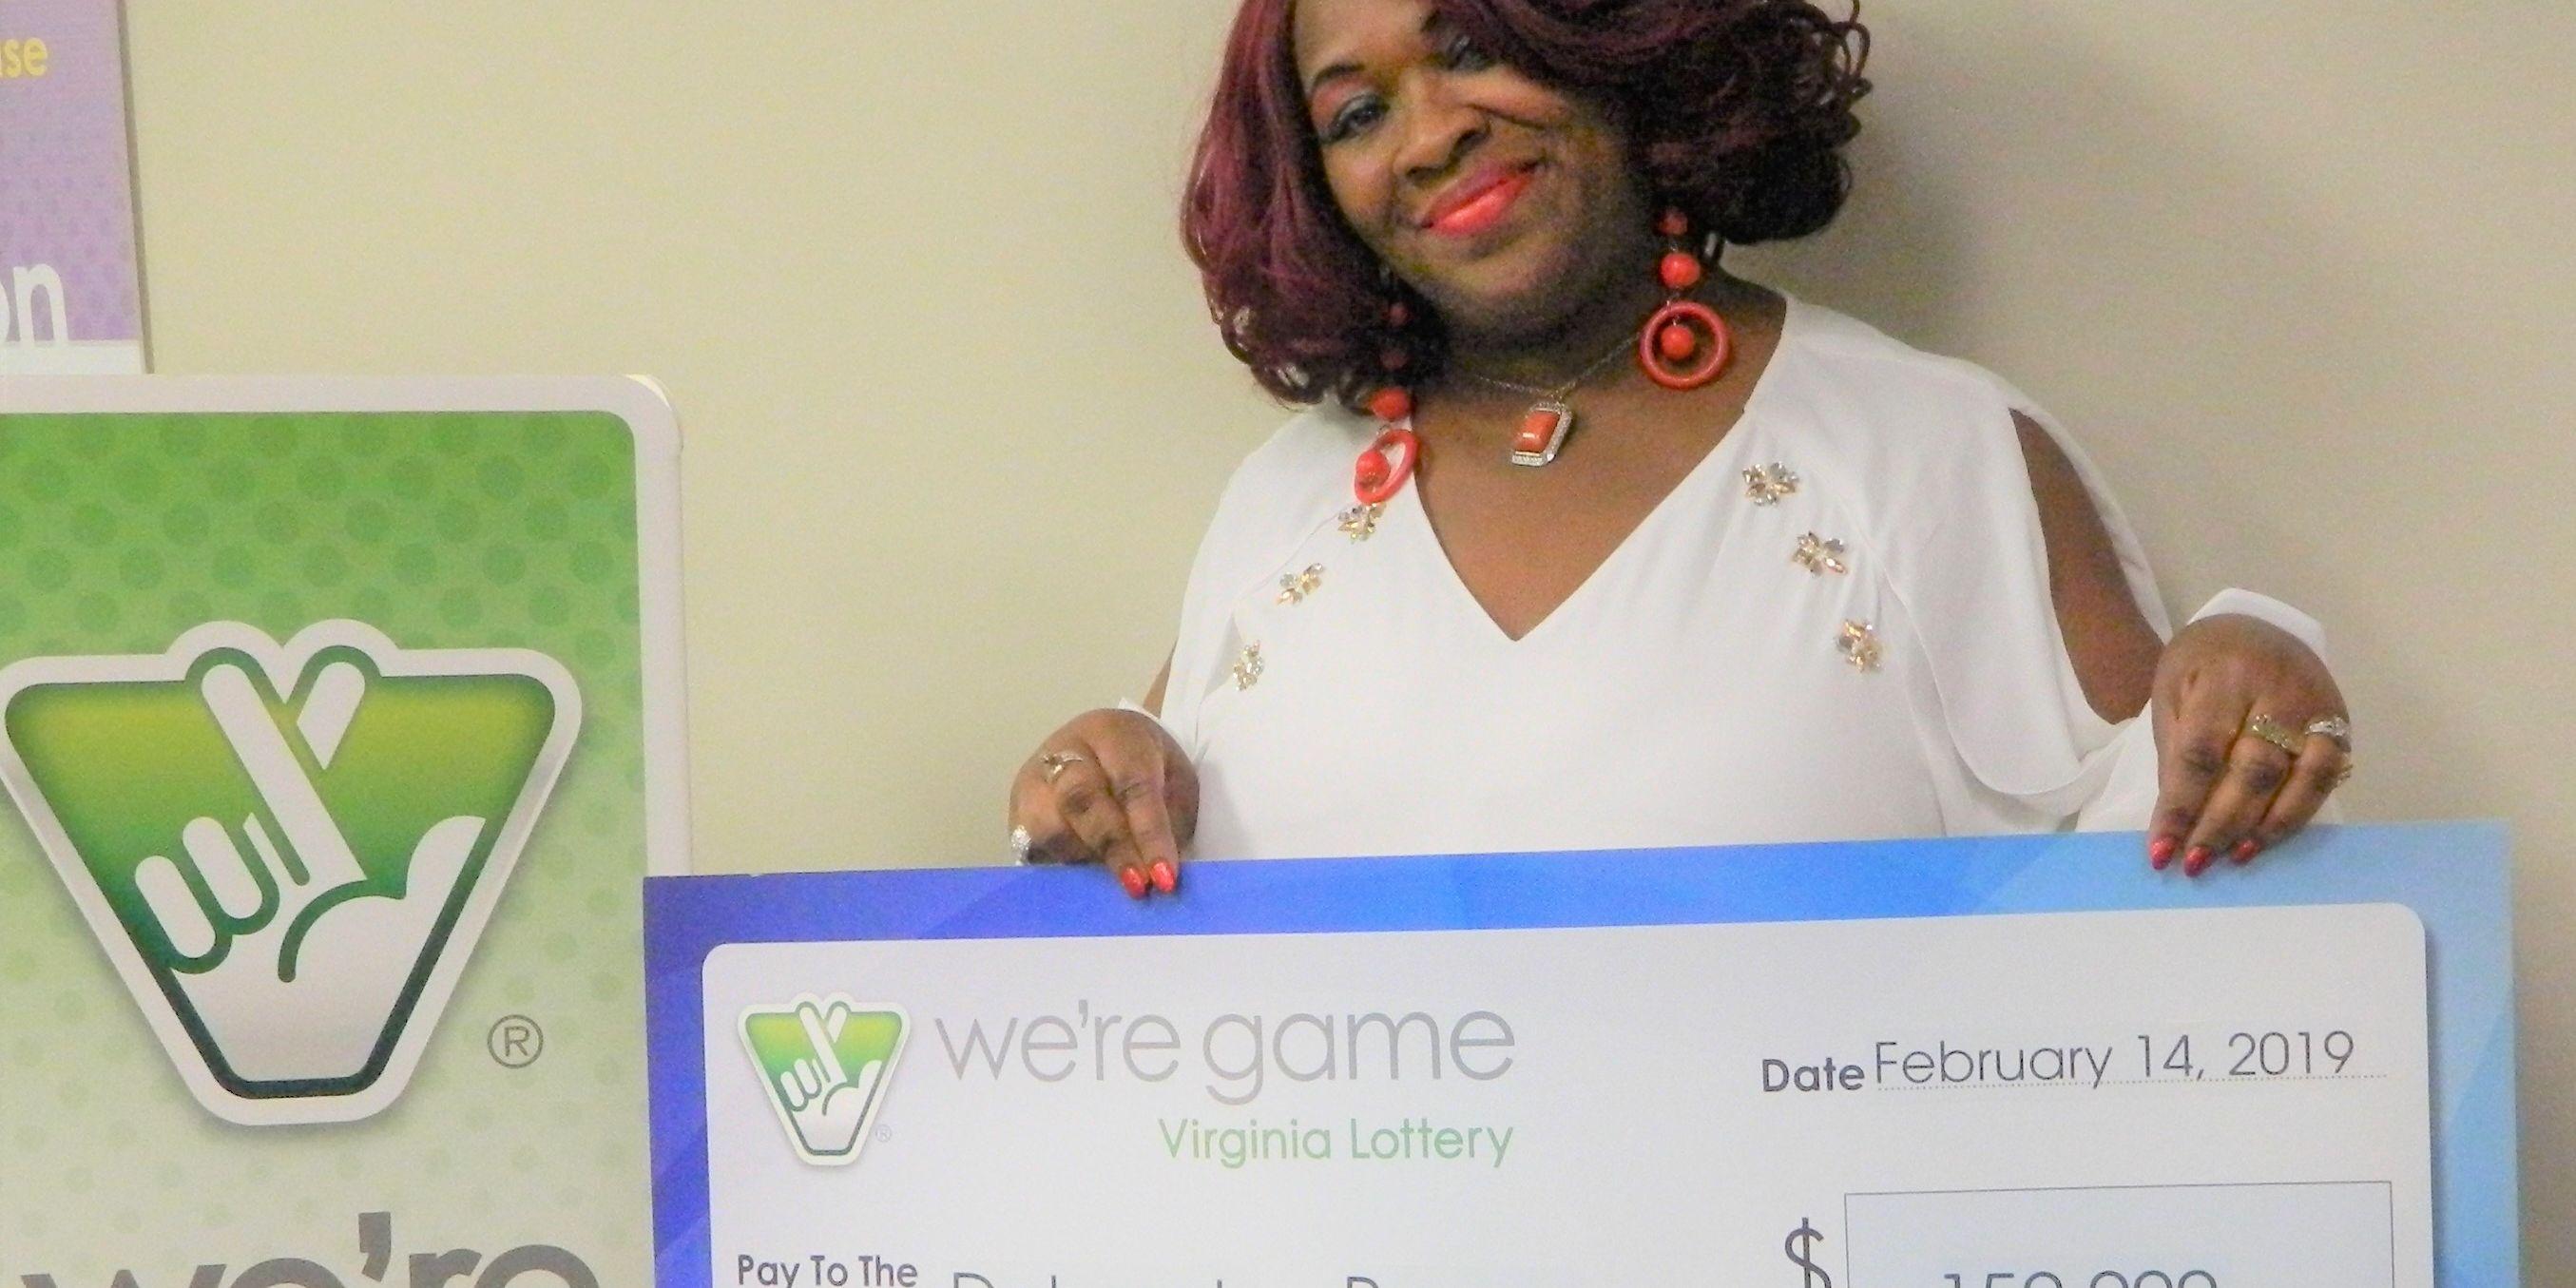 Richmond woman plays same Pick 4 numbers 30 times, banks $150K